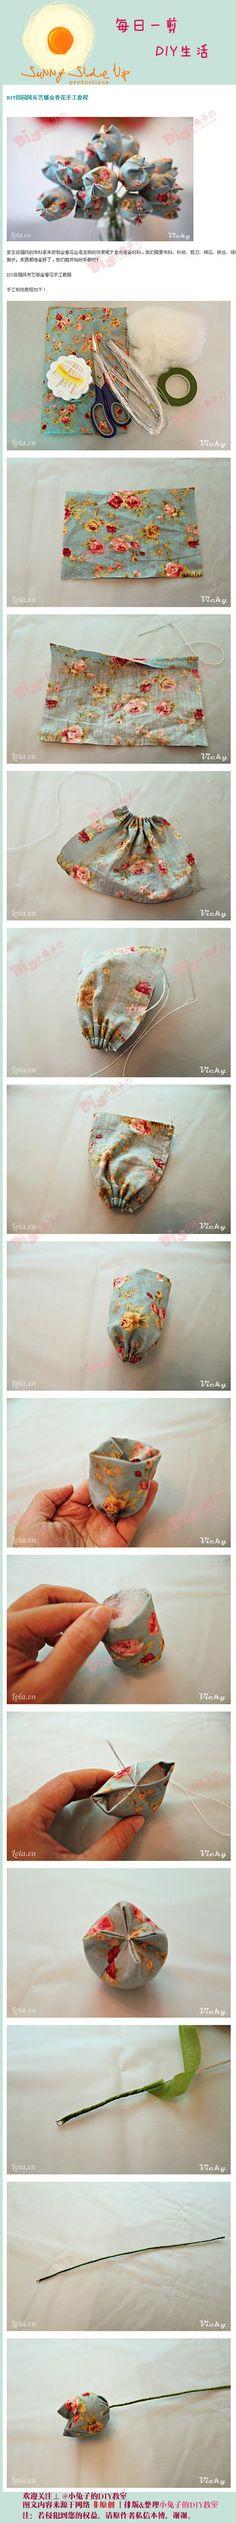 http://indulgy.com/post/zAIVt3NvQ2/diy-fabric-tulip-flower-diy-fabric-tulip-flower